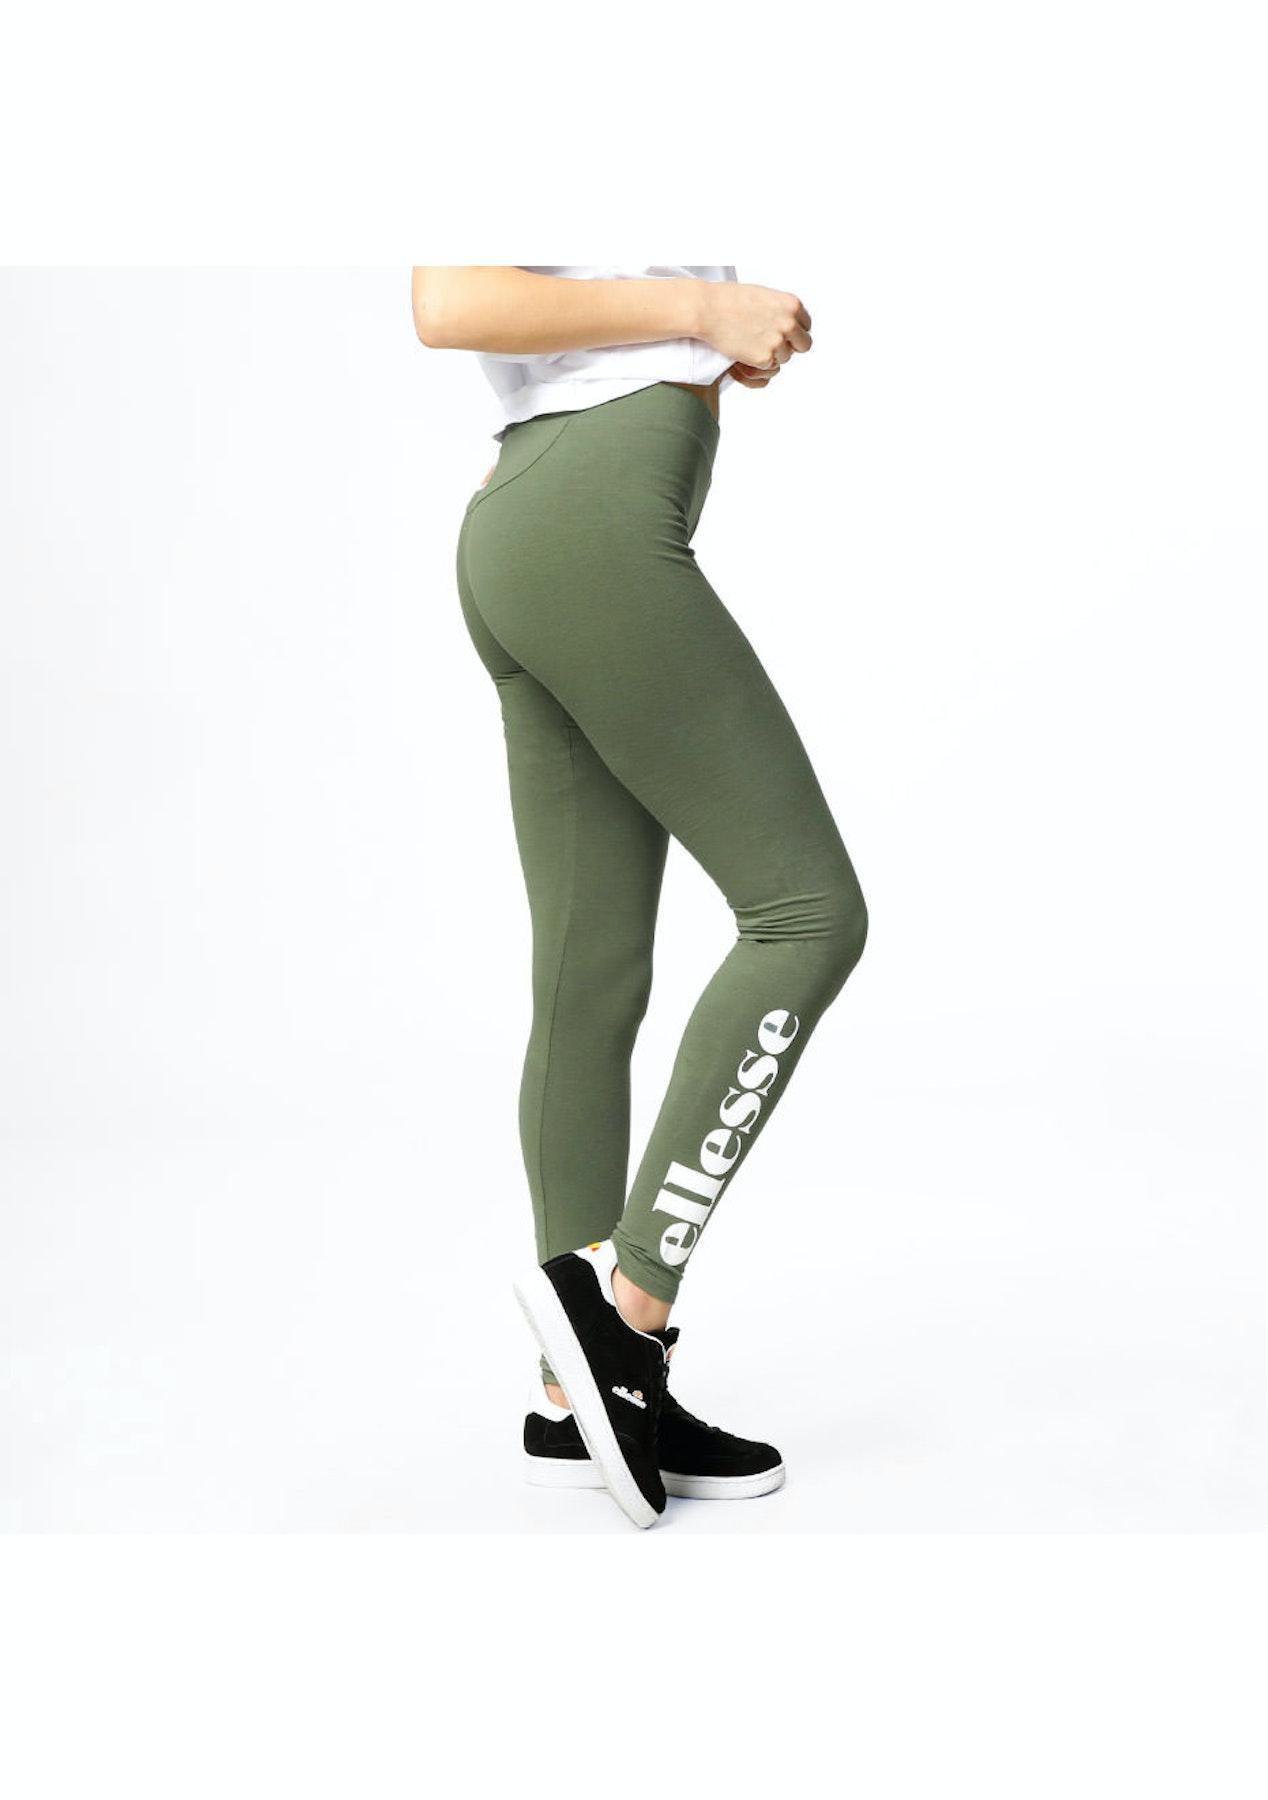 aaeeb0cf39c1b Ellesse - Womens - Solos Legging - Bronze Green - Womens Streetwear Sale -  Onceit